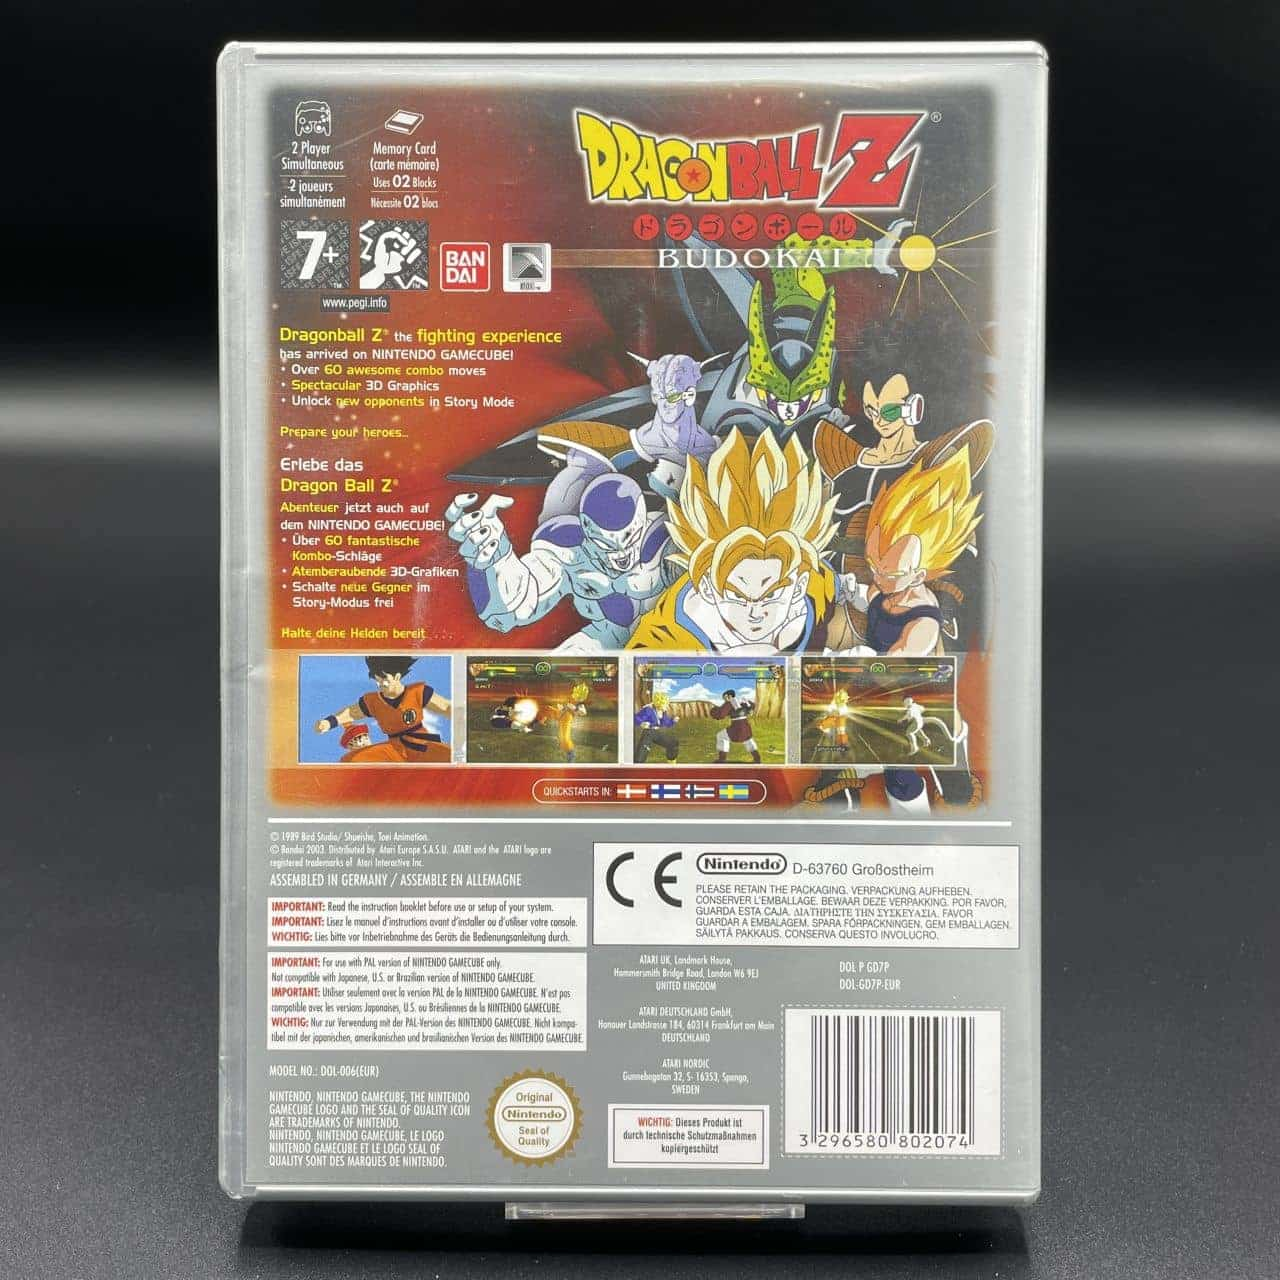 GC Dragon Ball Z: Budokai (Players Choise) (Komplett) (Gebrauchsspuren) Nintendo GameCube